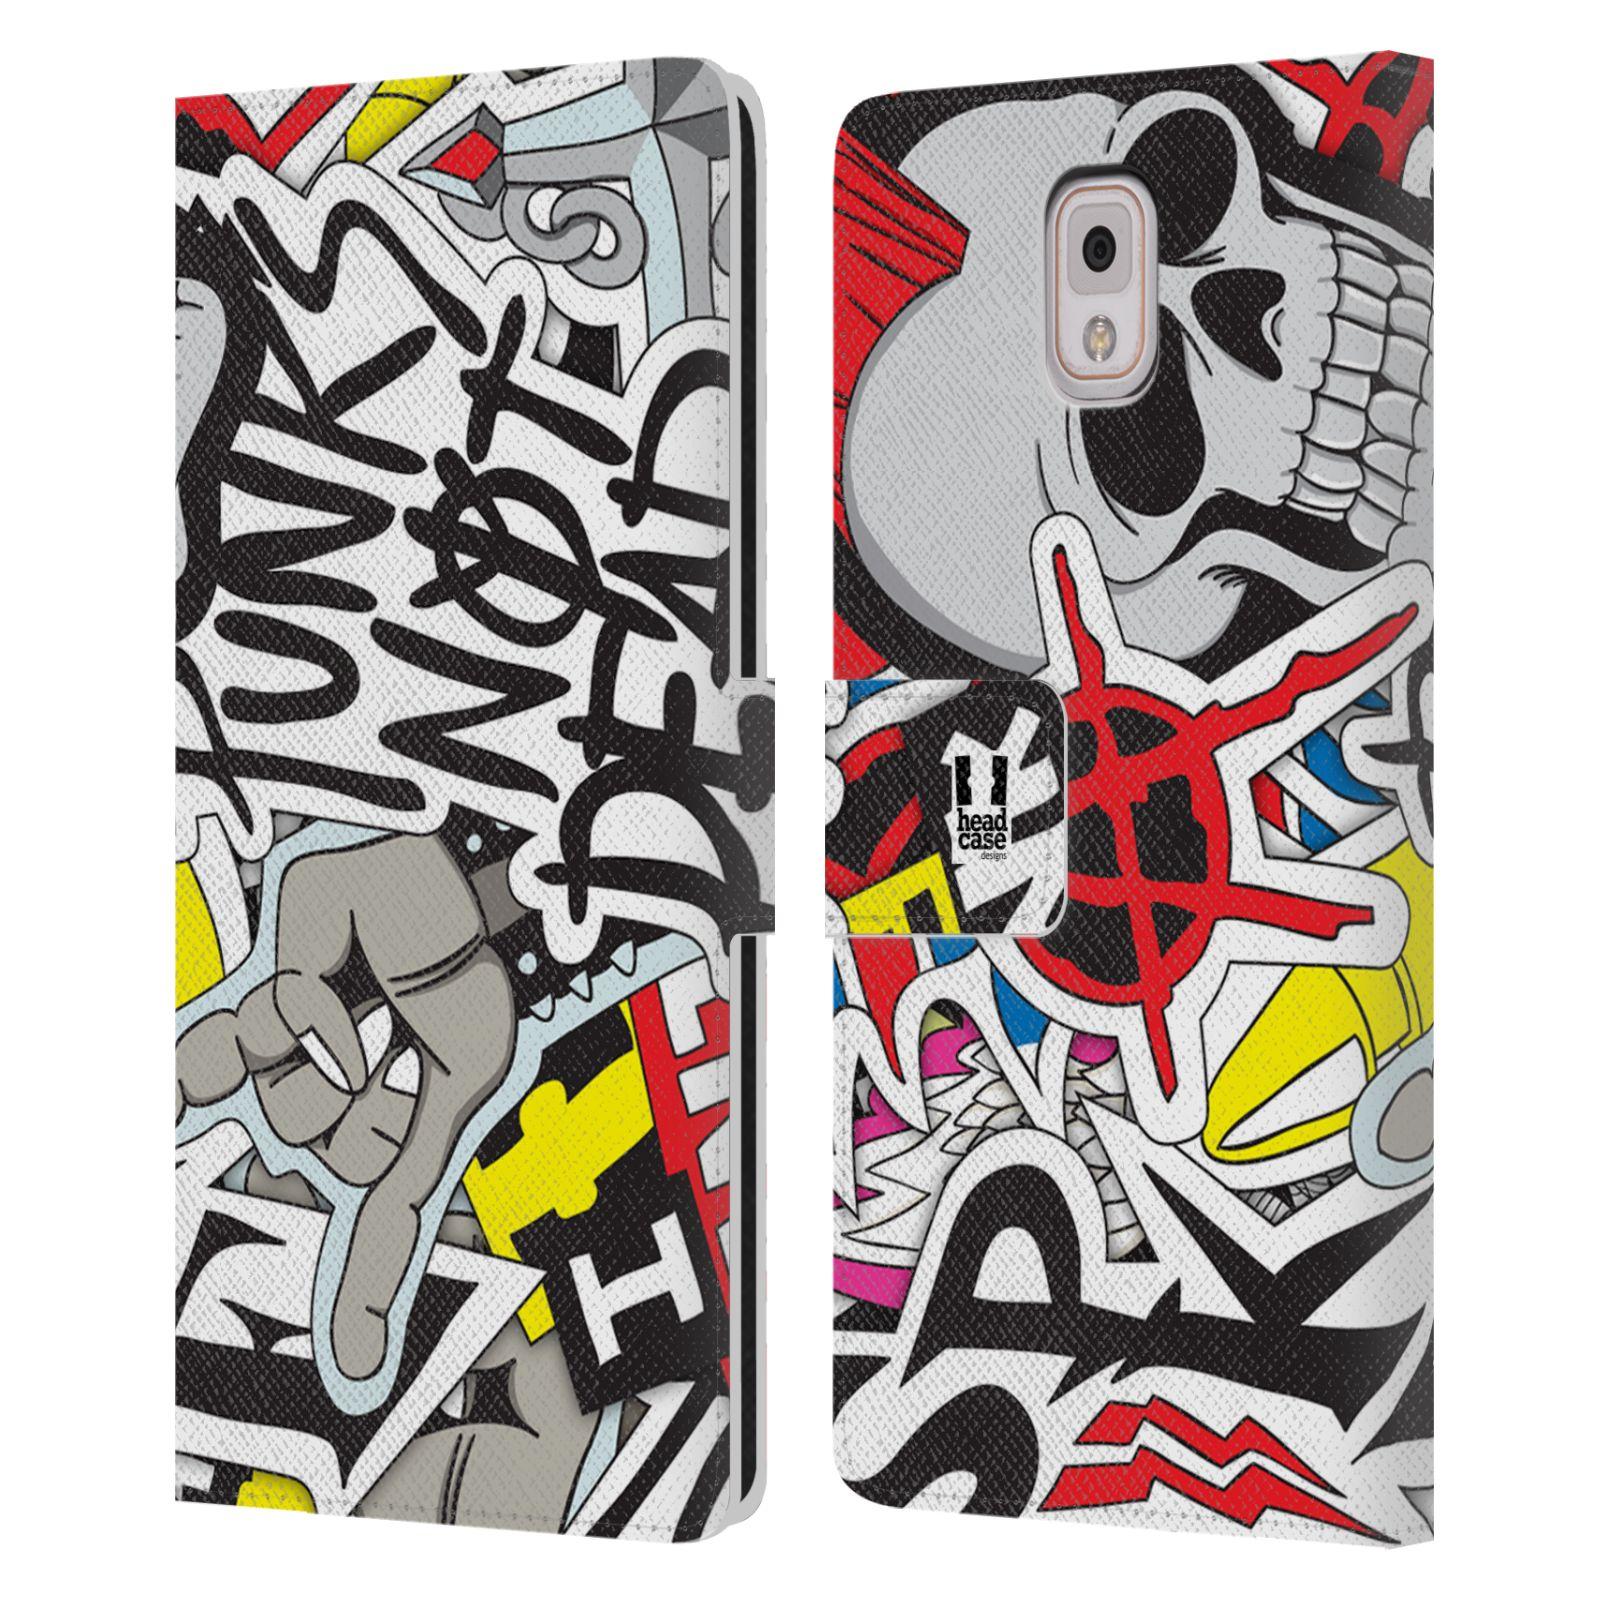 HEAD CASE Flipové pouzdro pro mobil Samsung Galaxy Note 3 N9005 vzor STICKER nálepky PUNK IS NOT DEAD